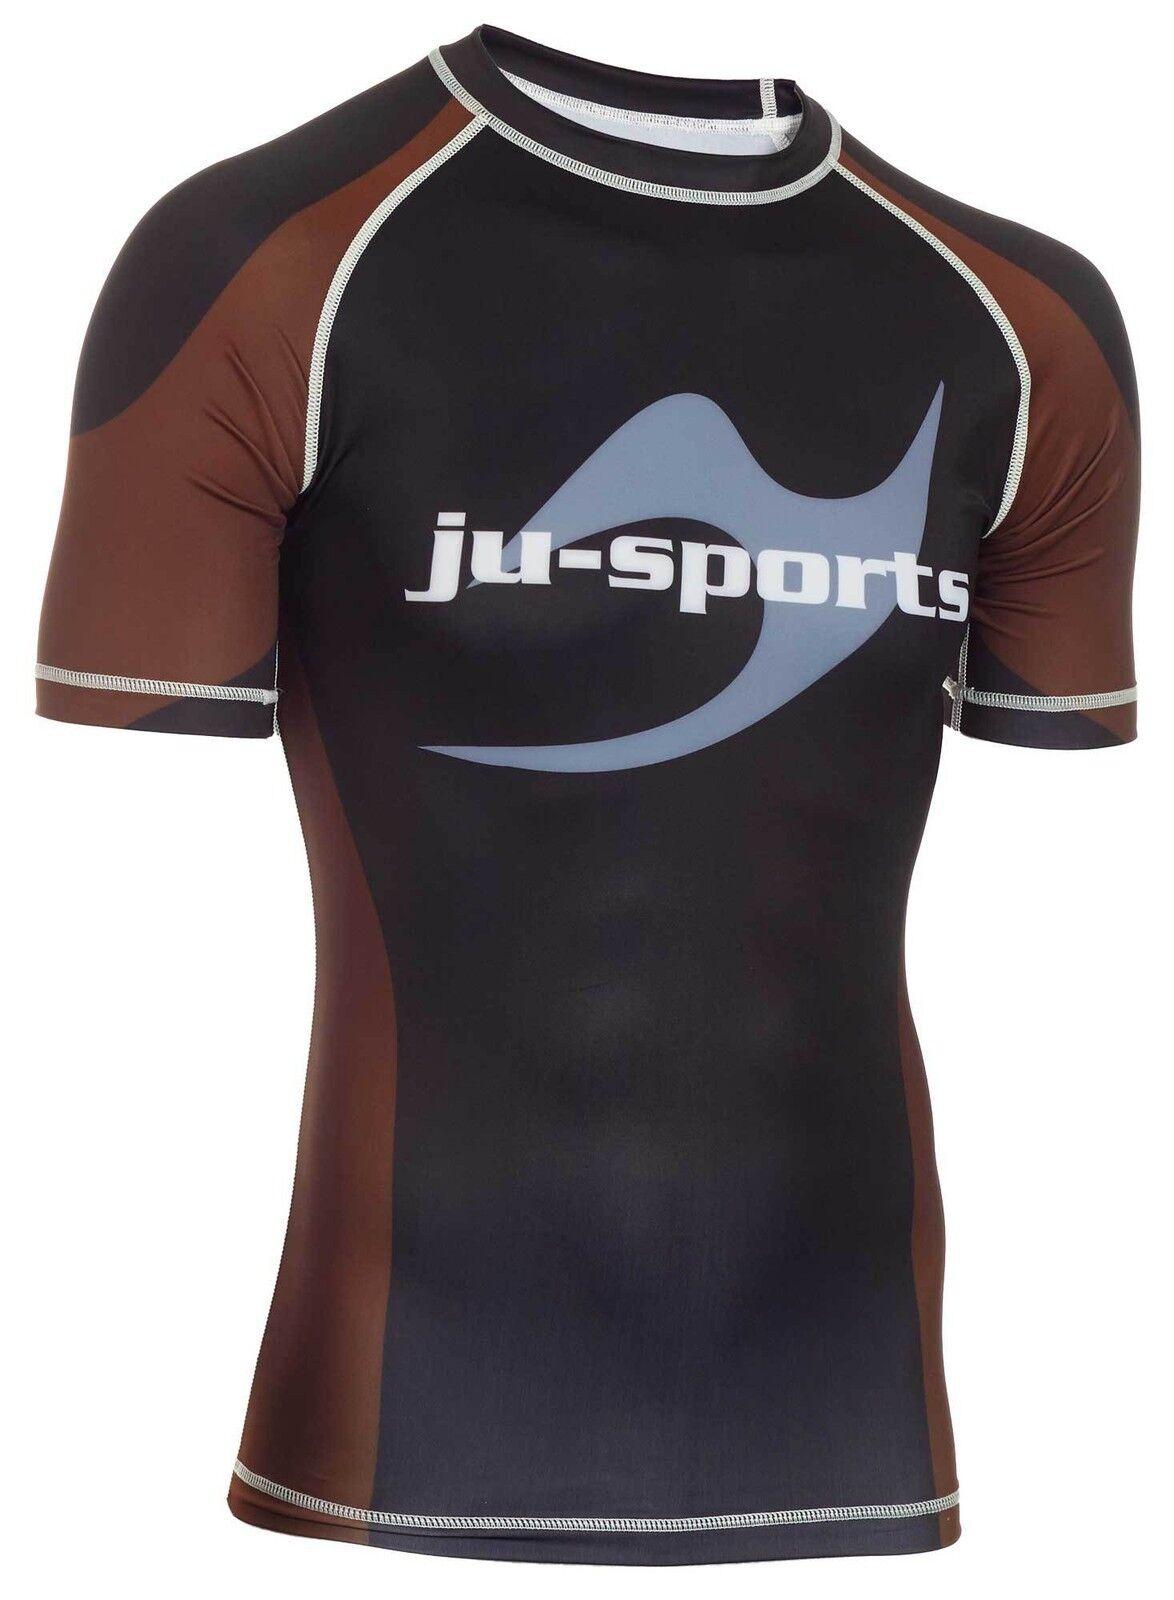 Ju-Sports Rank Rashguard Pro kurzarm braun braun braun für BJJ braun Belts (Braungurte)  | Guter weltweiter Ruf  | Hochwertige Materialien  | New Listing  add35b